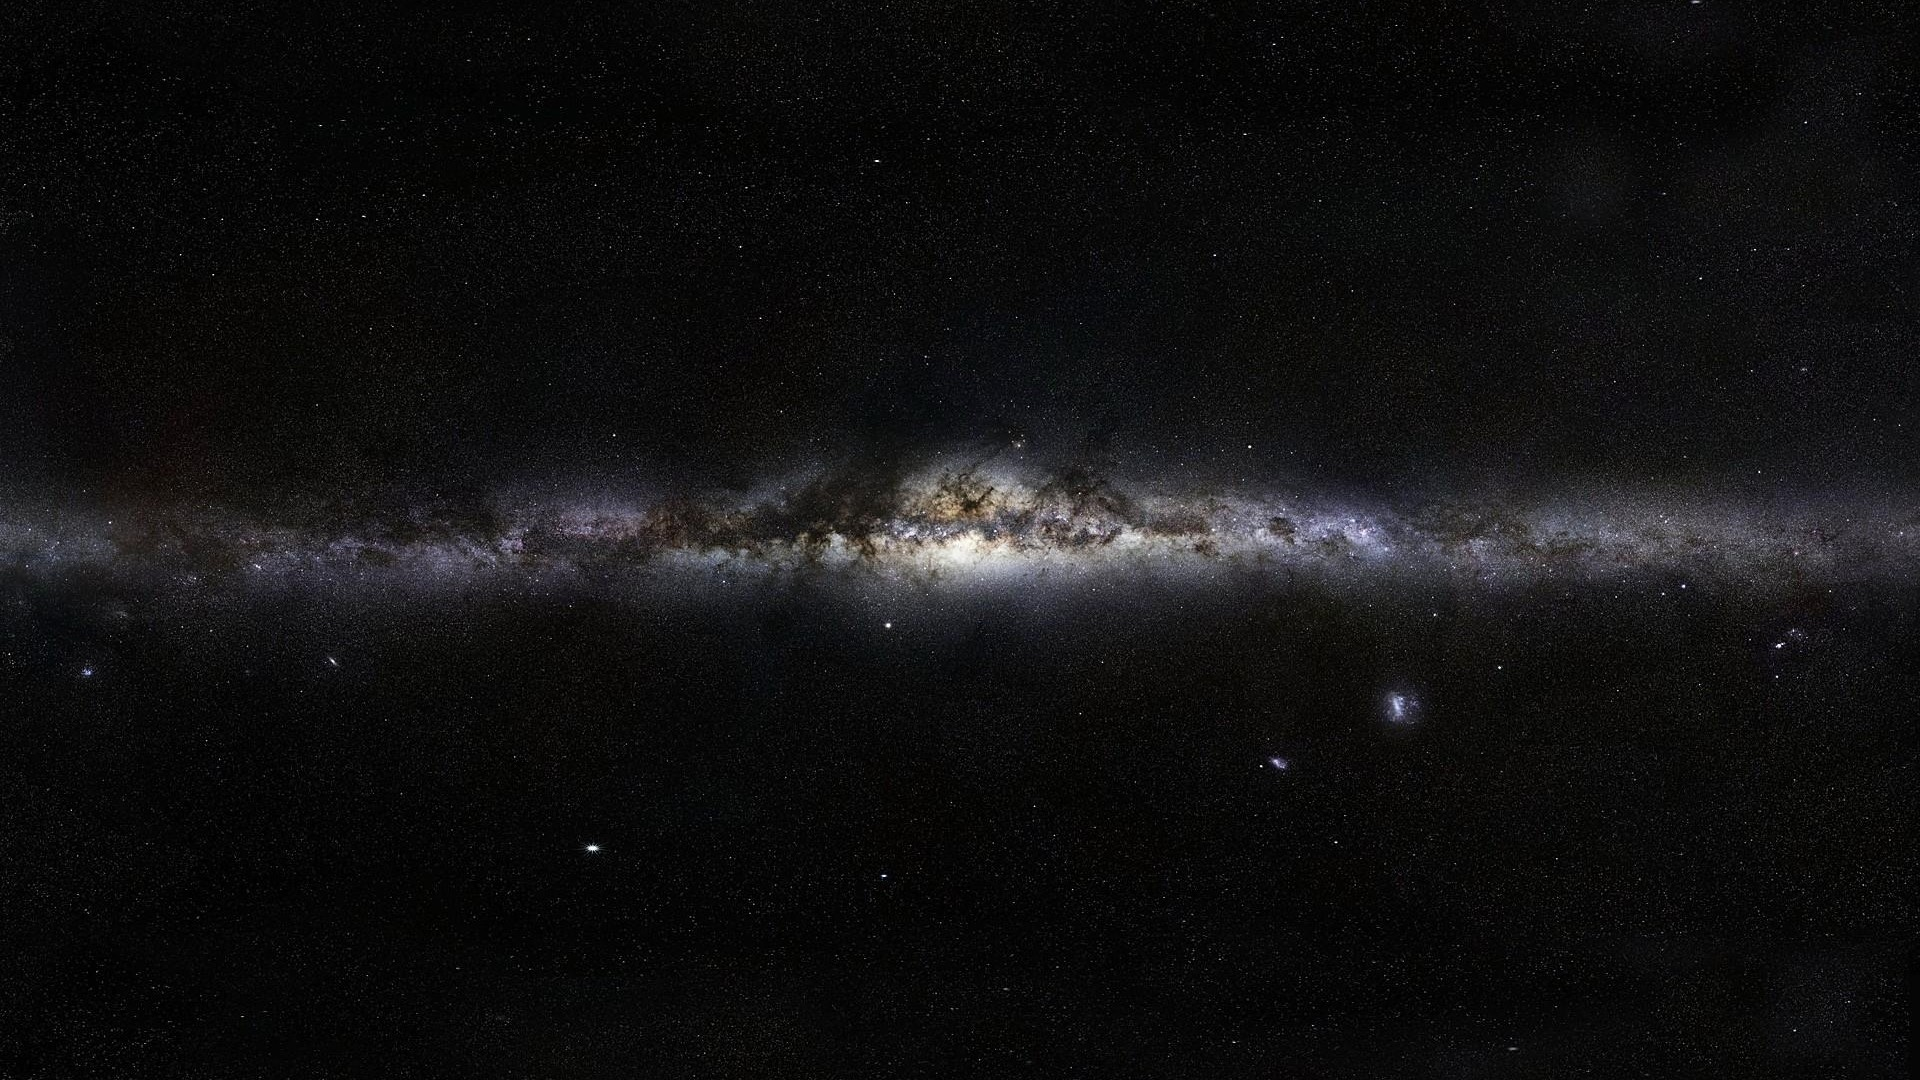 … Background Full HD 1080p. Wallpaper milky way, stars, space,  nebula